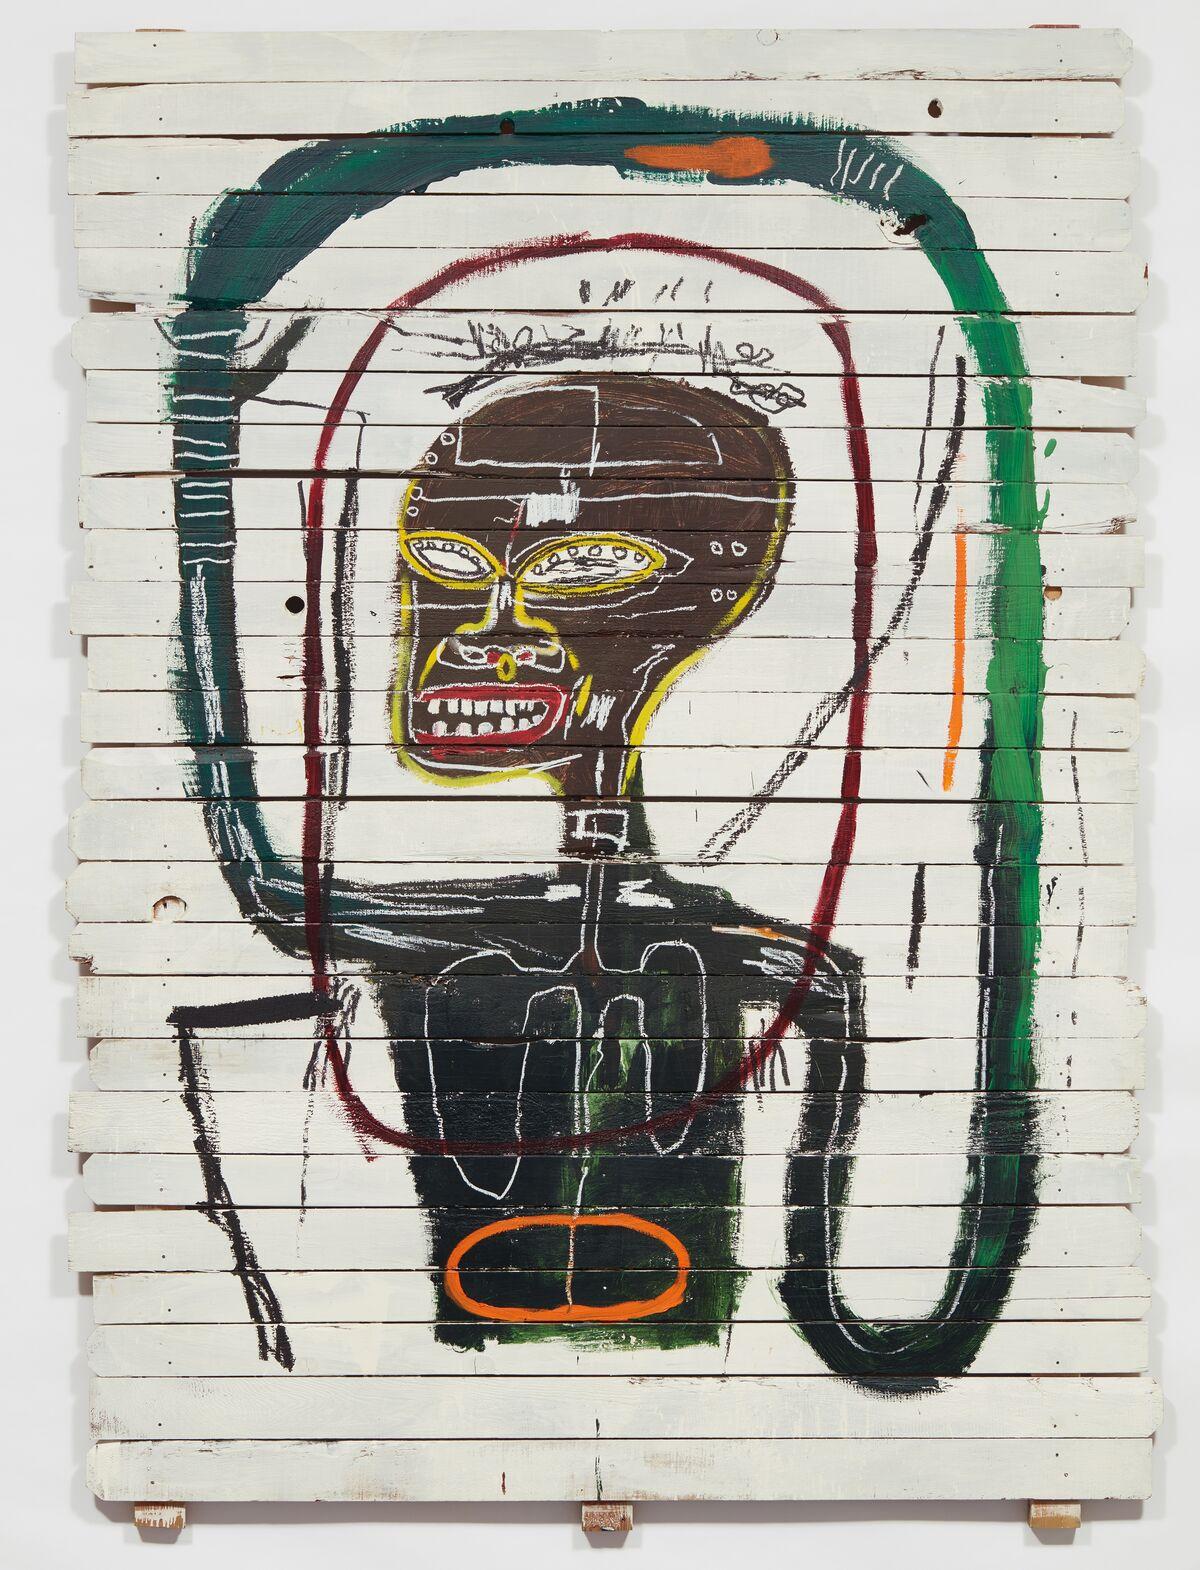 Jean-Michel Basquiat, Flexible, 1984. Courtesy of Phillips.